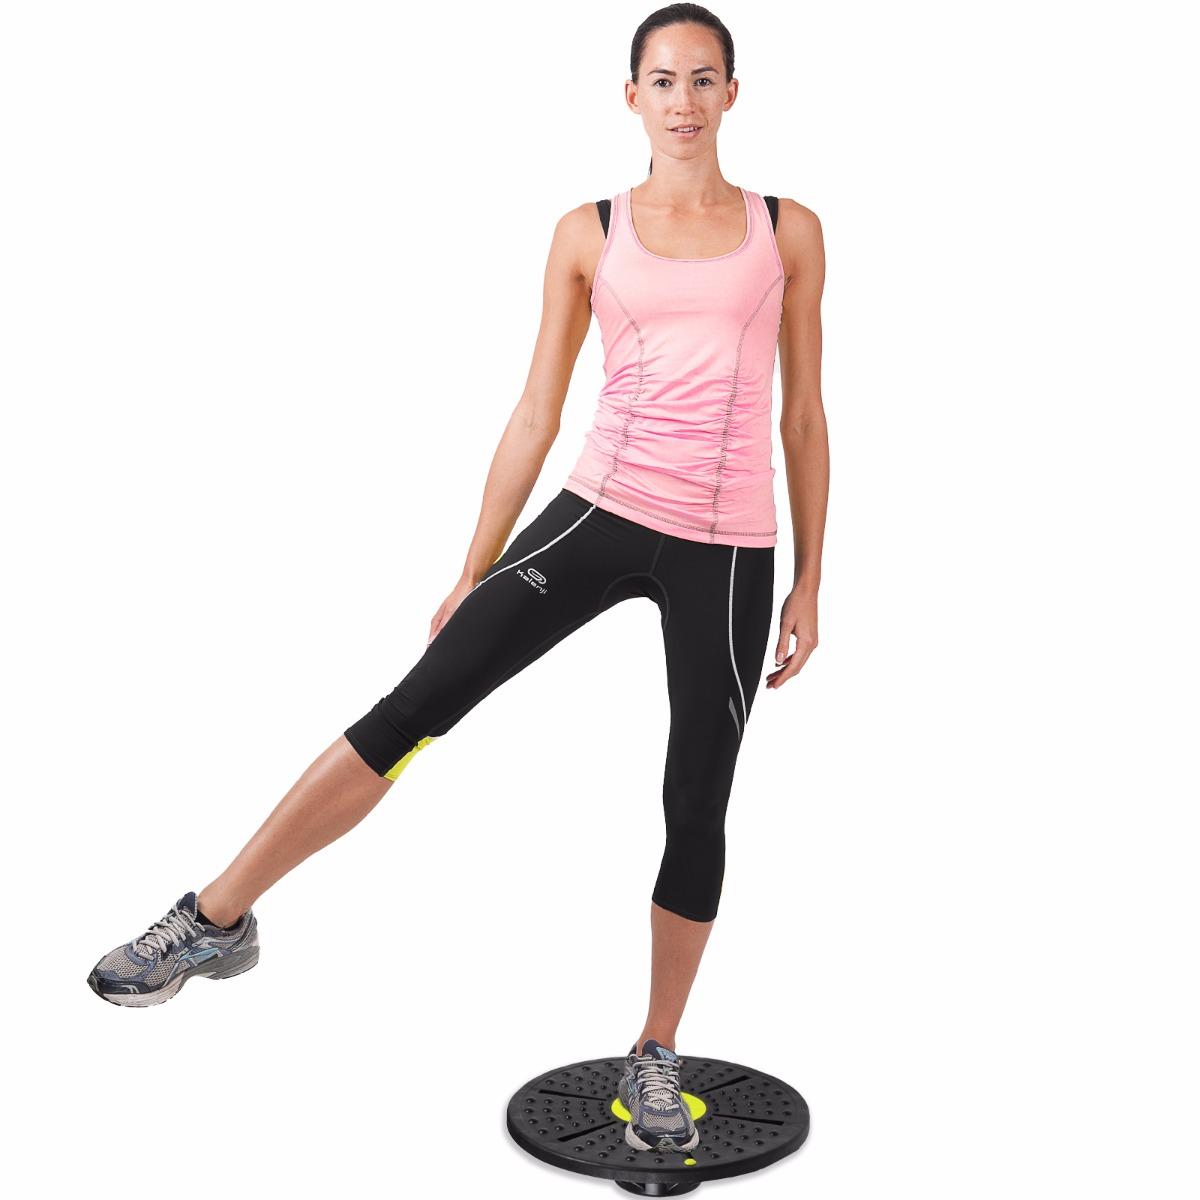 Balance Board Sport Yoga: Gallant Balance Wobble Board 40cm Rehabilitation Fitness